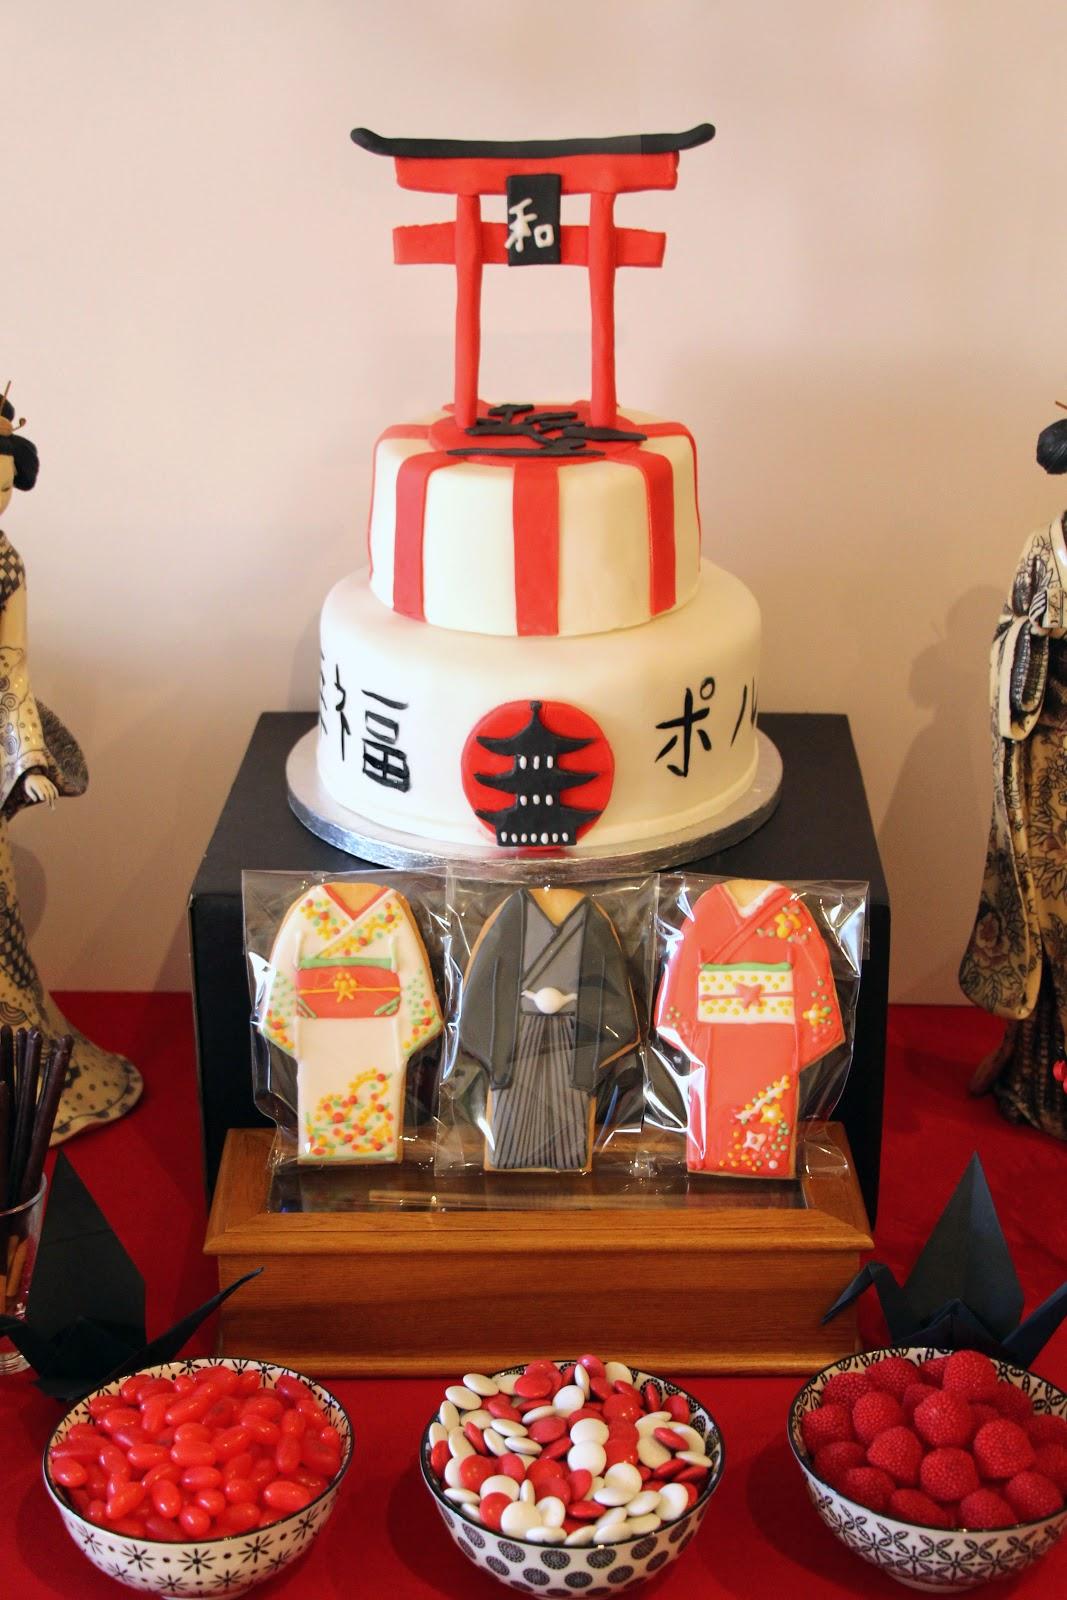 Mardefiesta fiesta japonesa - Decoracion japonesa ...